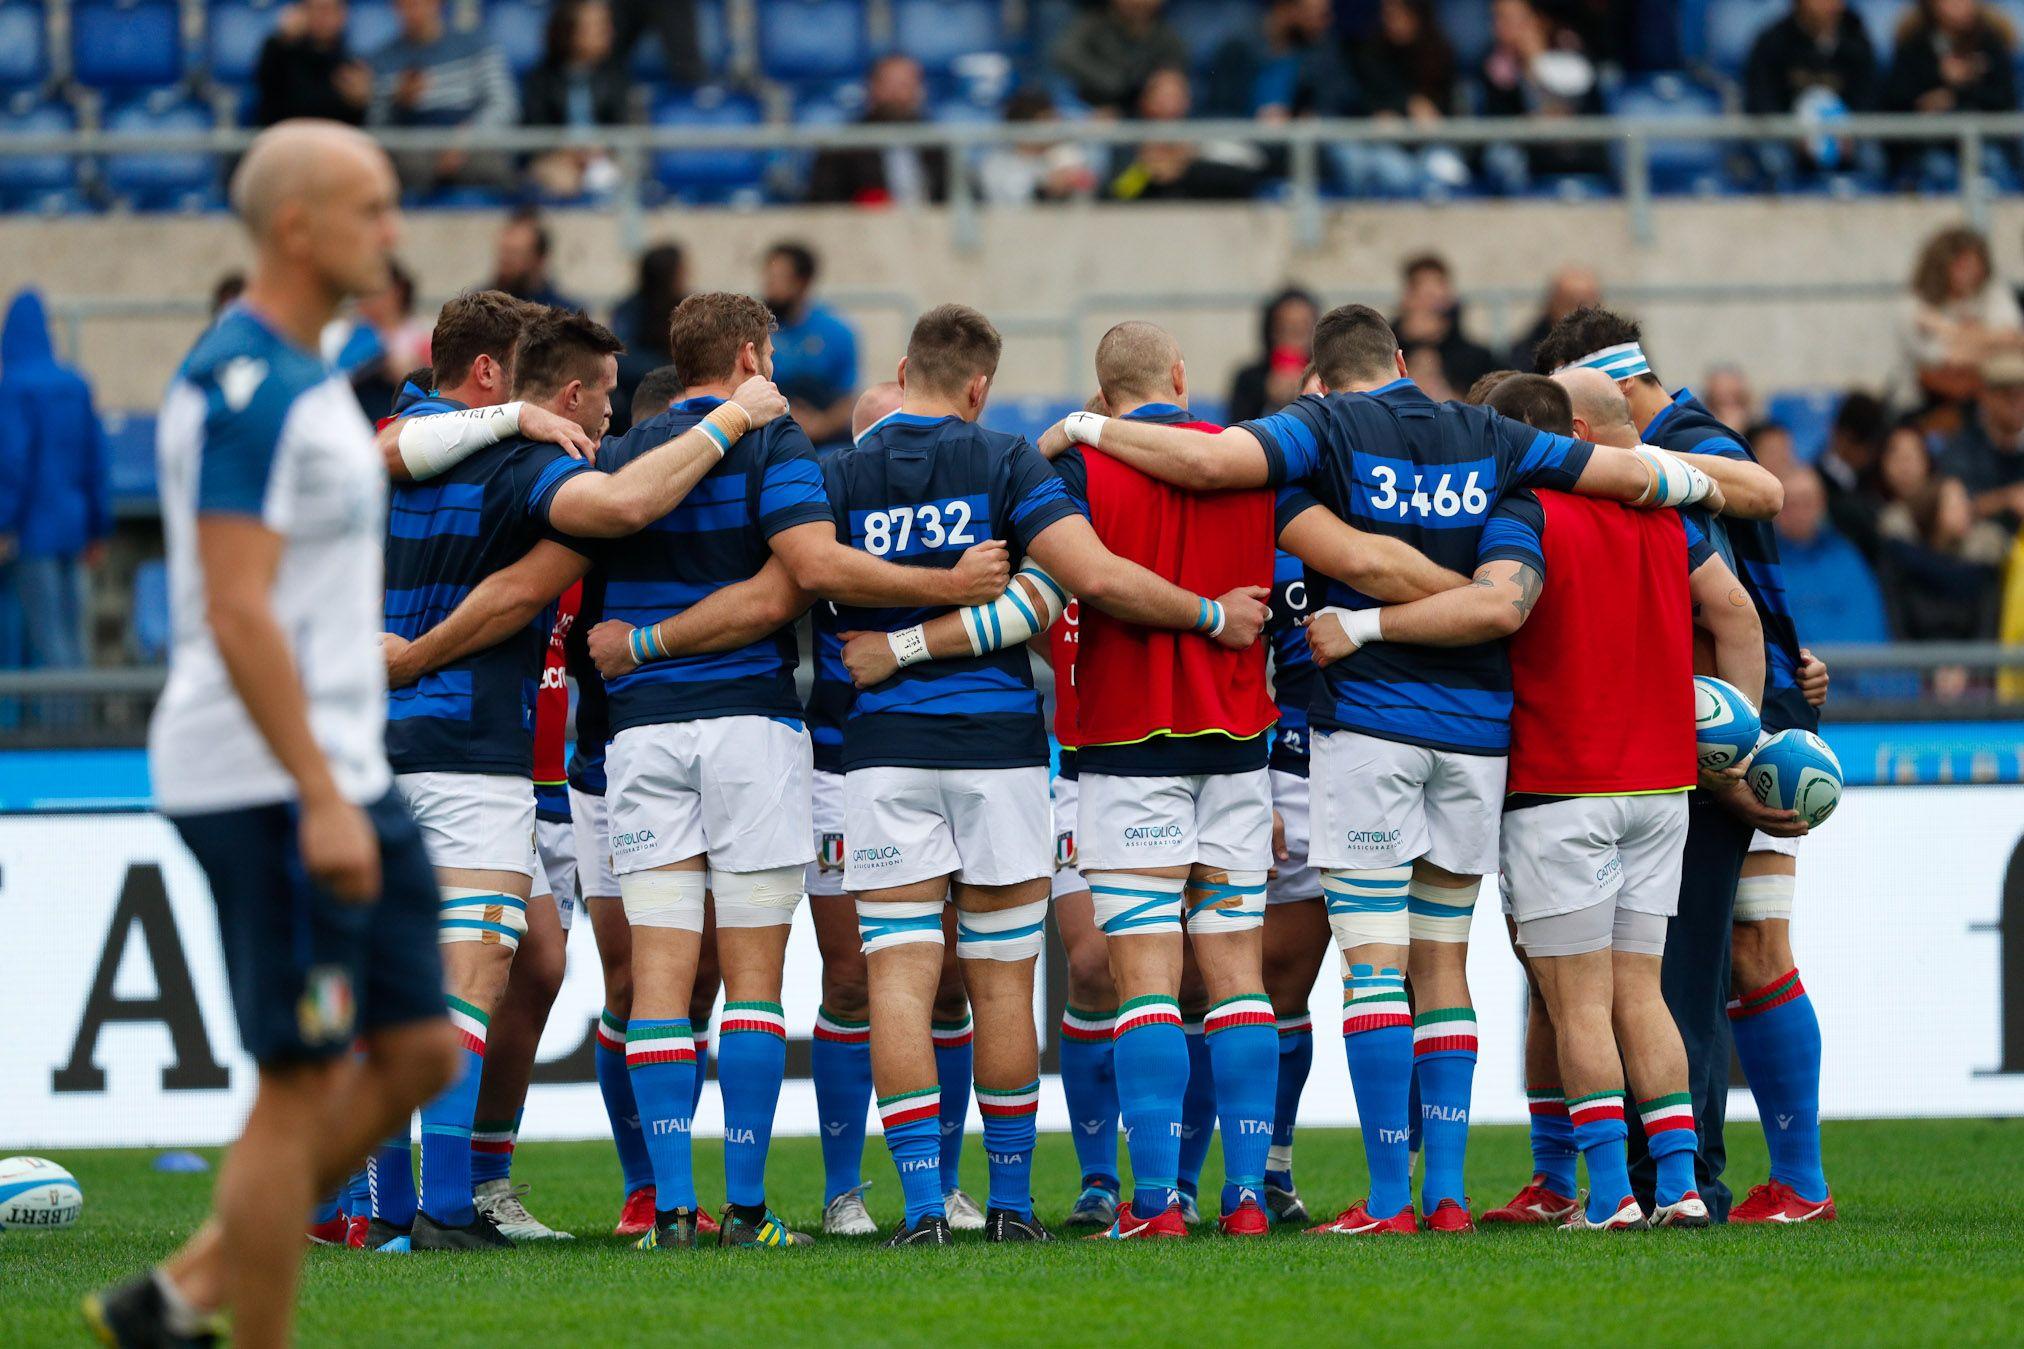 Rugby, Italia-Nuova Zelanda 3-66